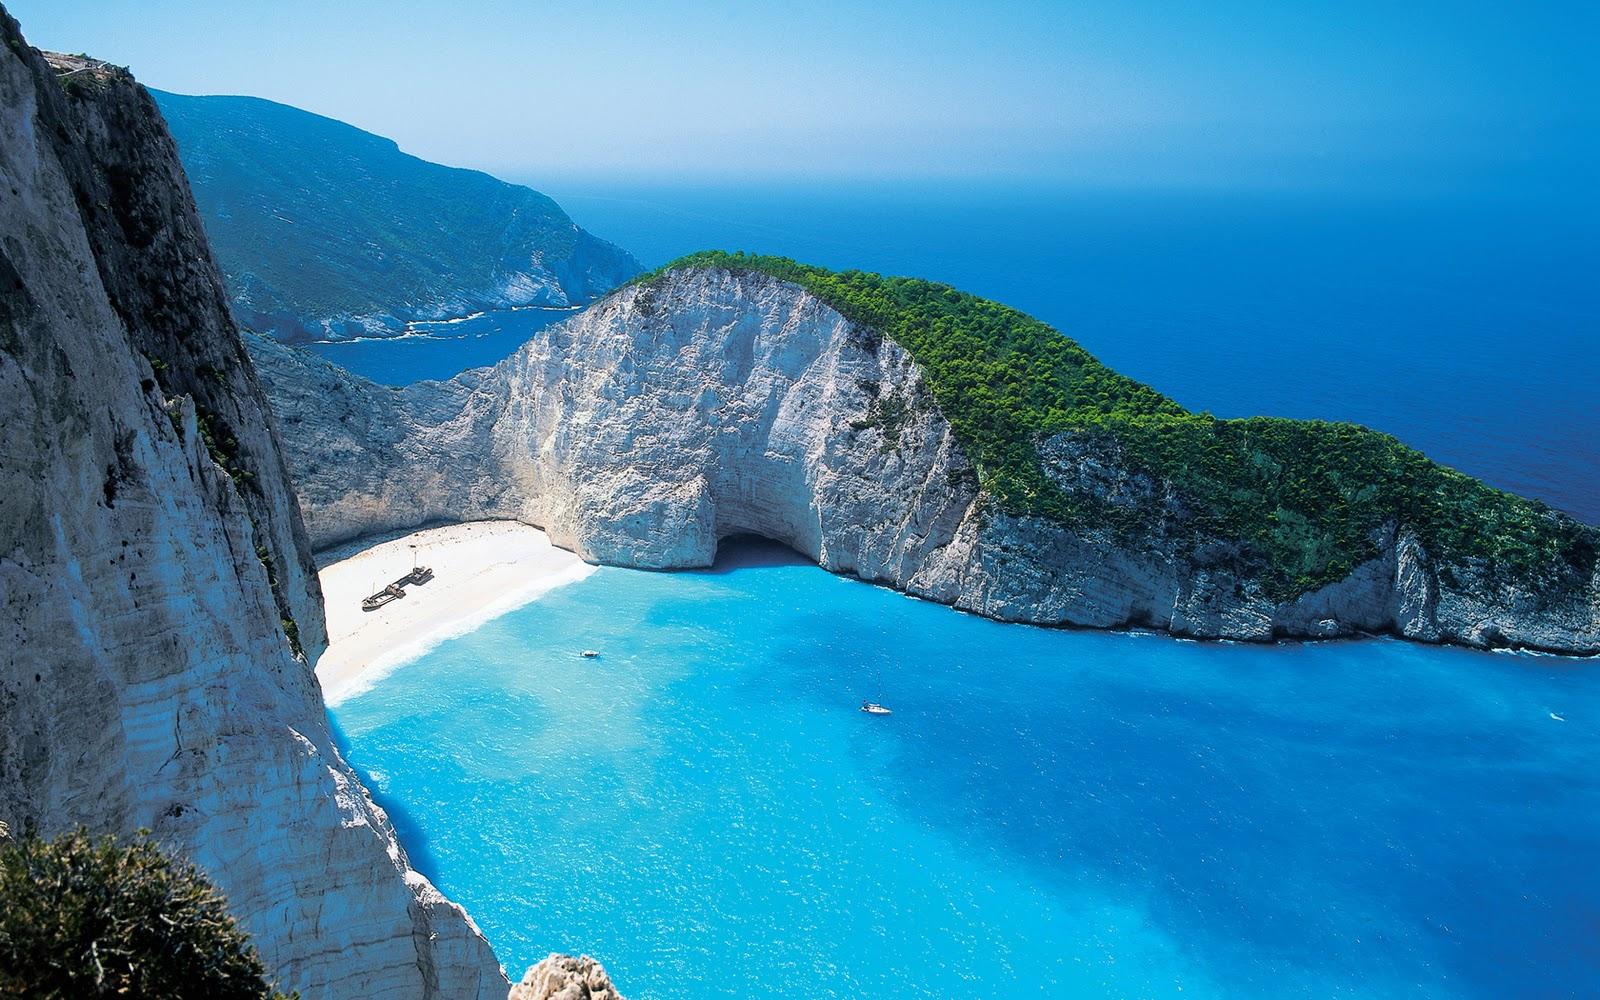 turquia-grecia-paquete-viaje-turismo